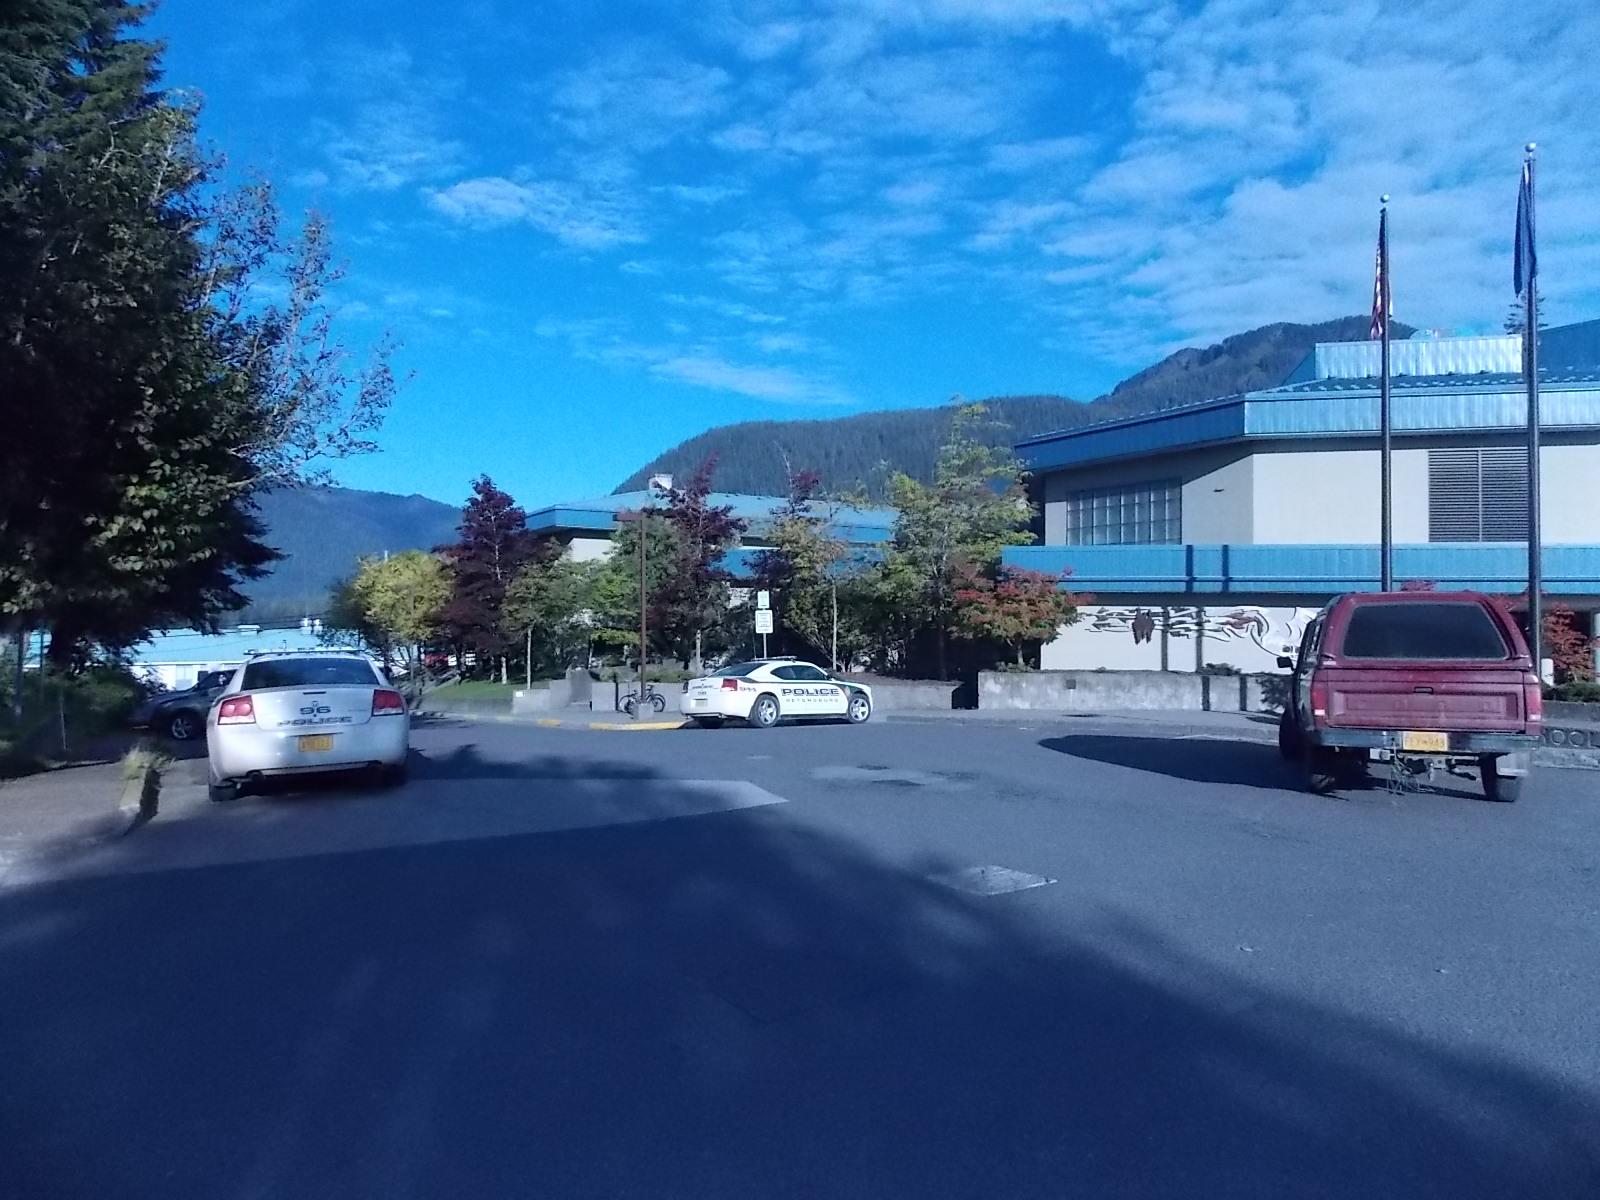 False alarm prompts school lockdown